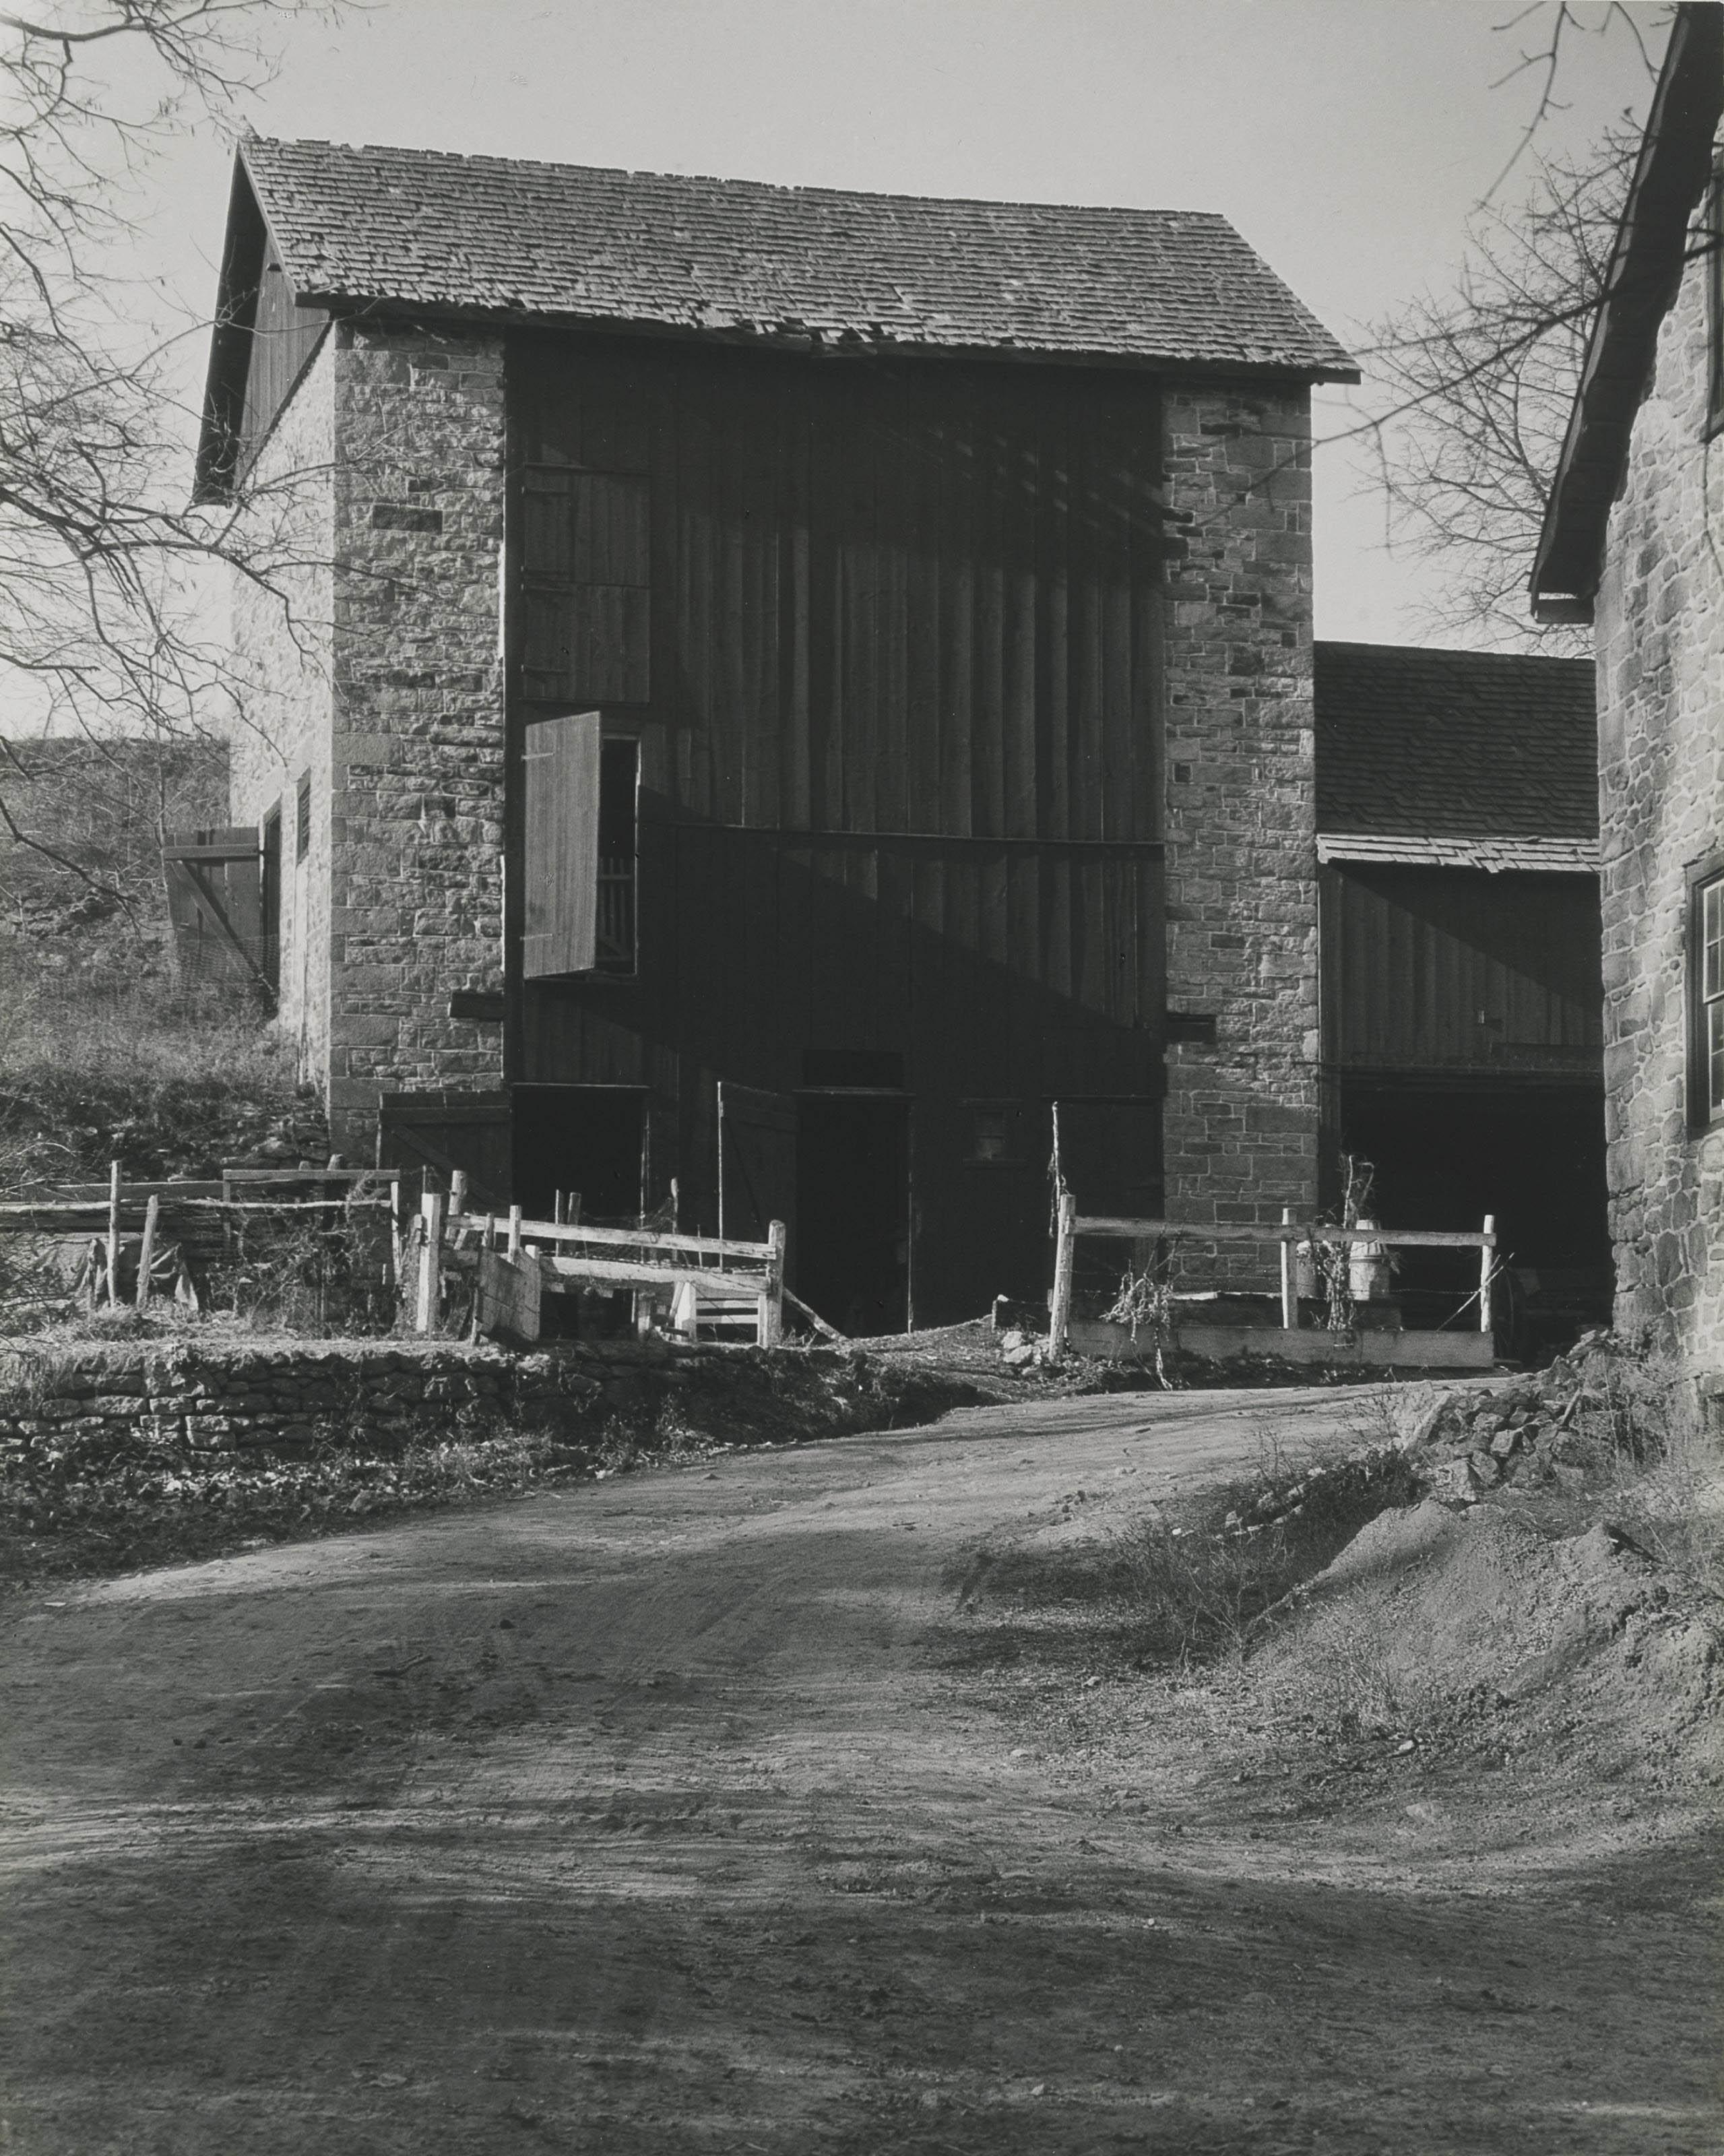 Bucks County Barn, 1915